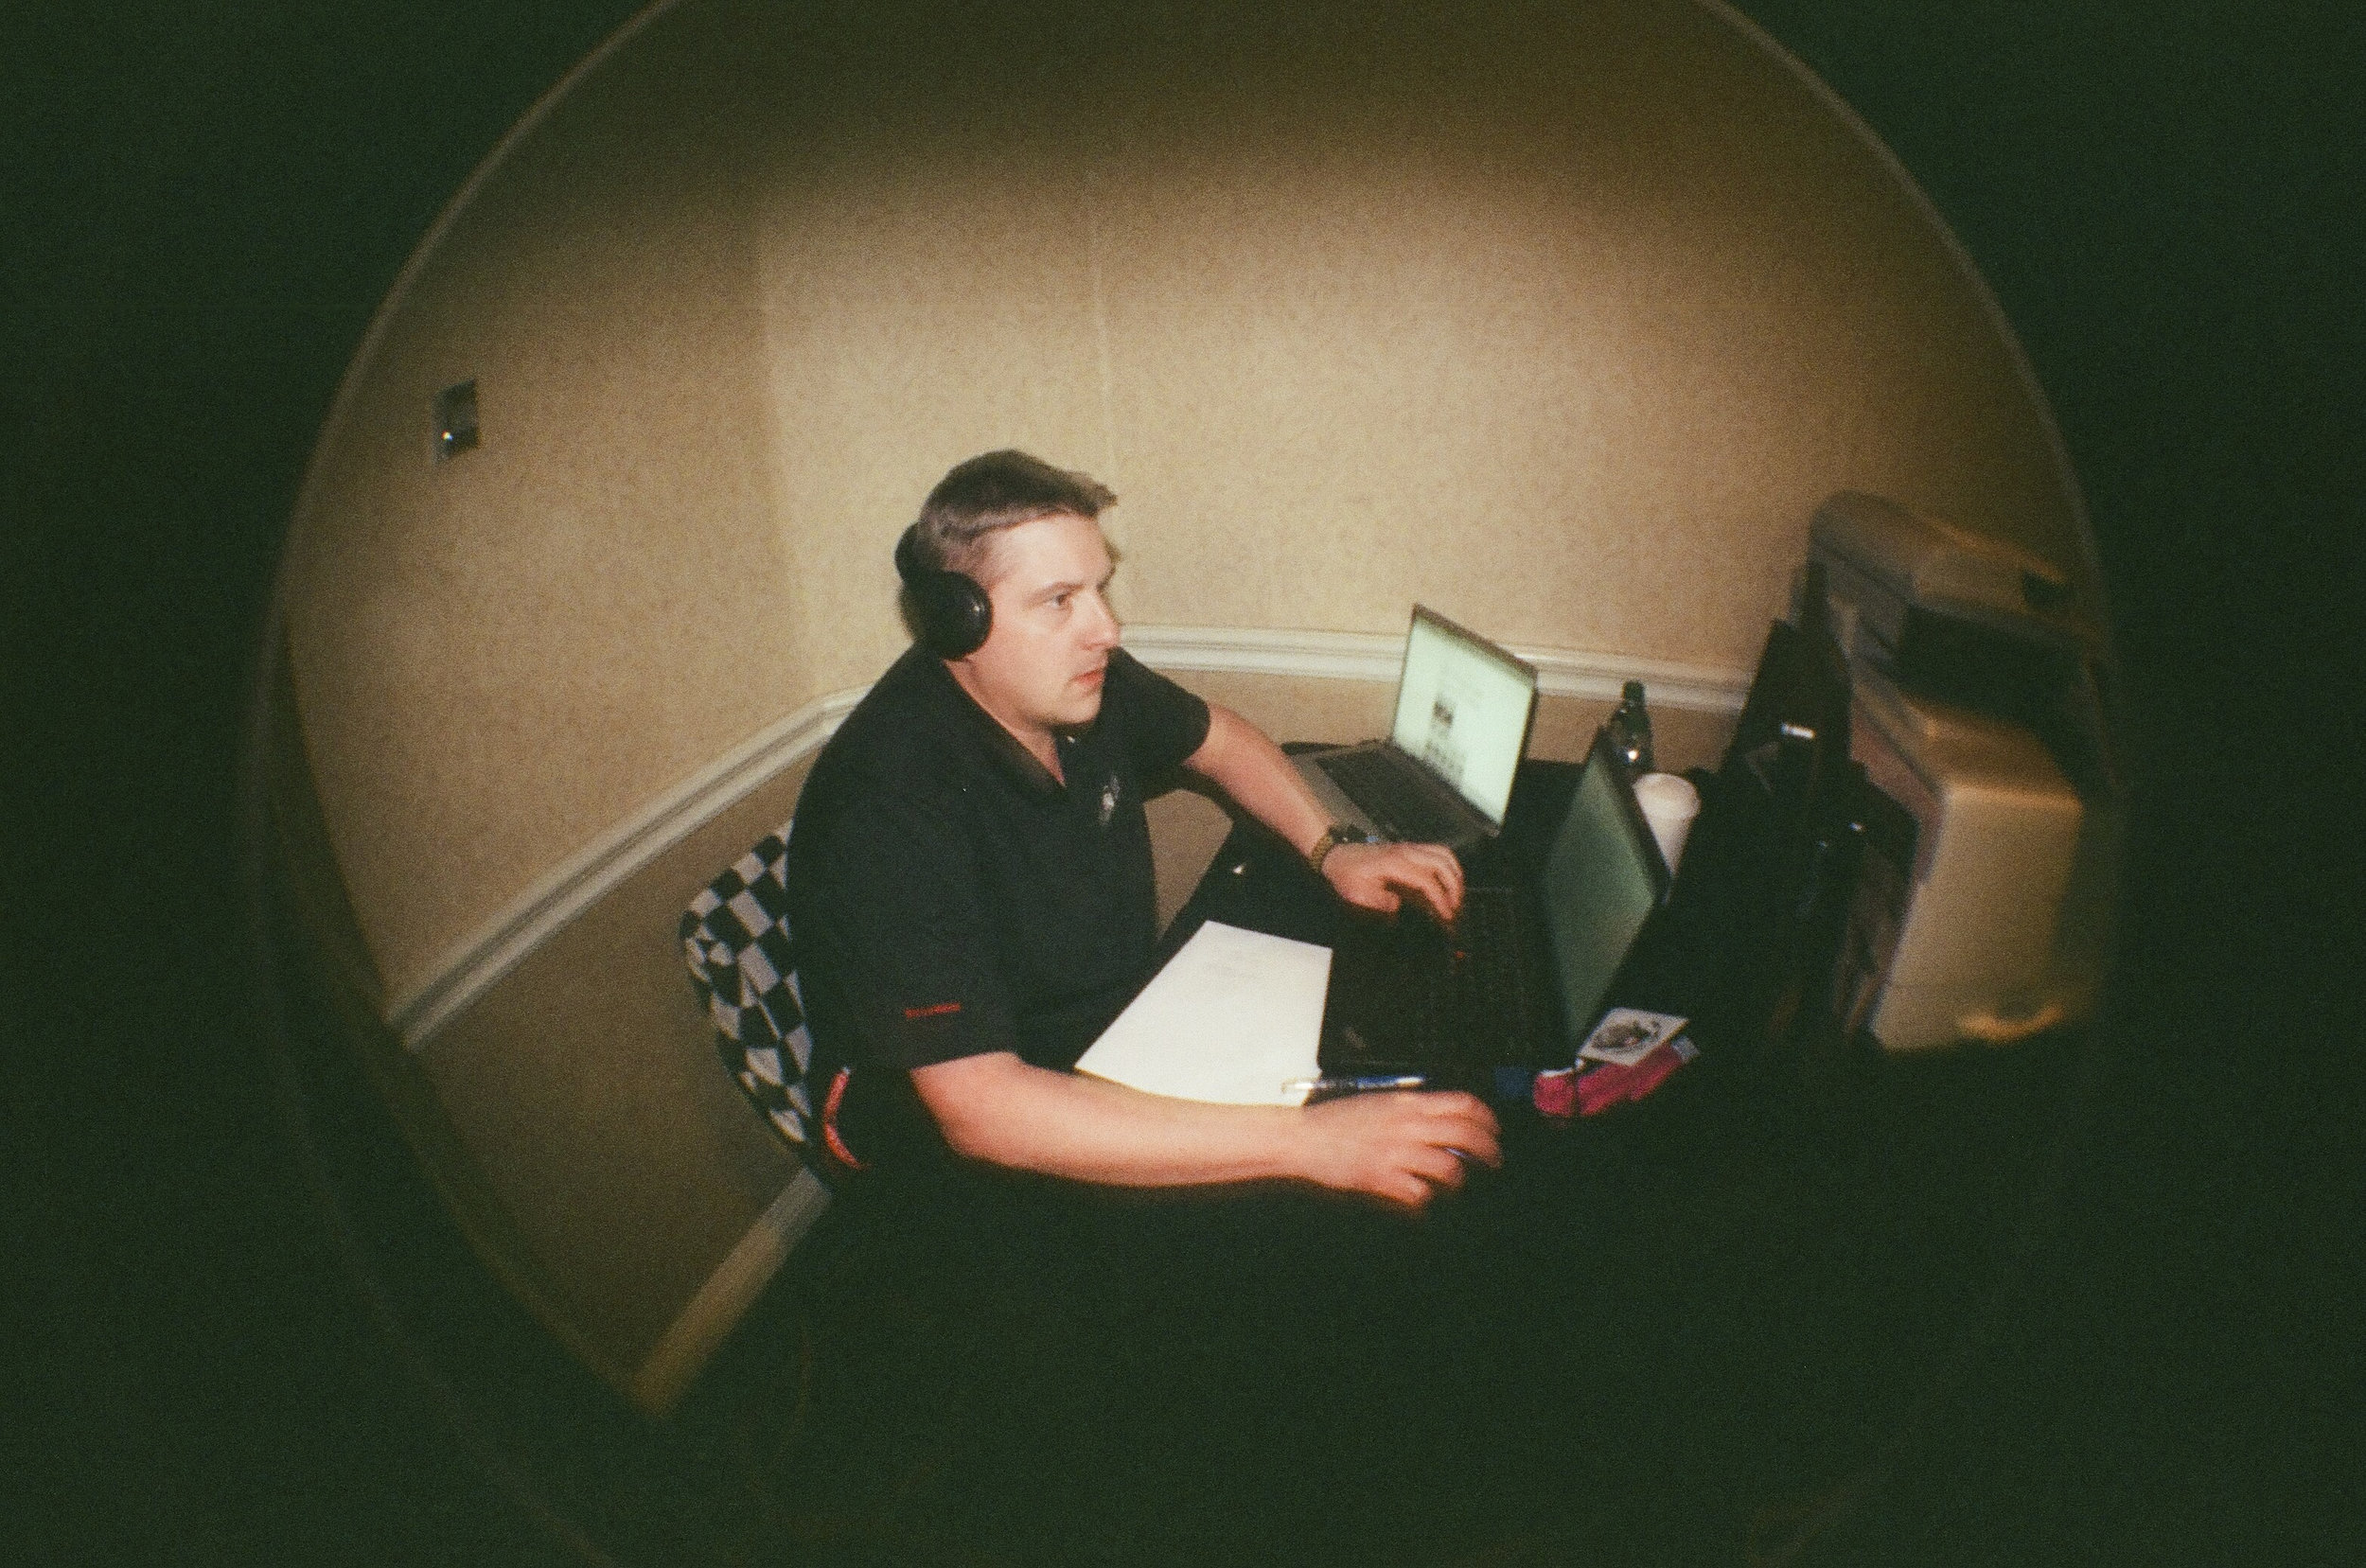 David Craske - Hardest working man in motorsport. - Shot with Lomography Fisheye One - 35mm Film - Long Beach, CA